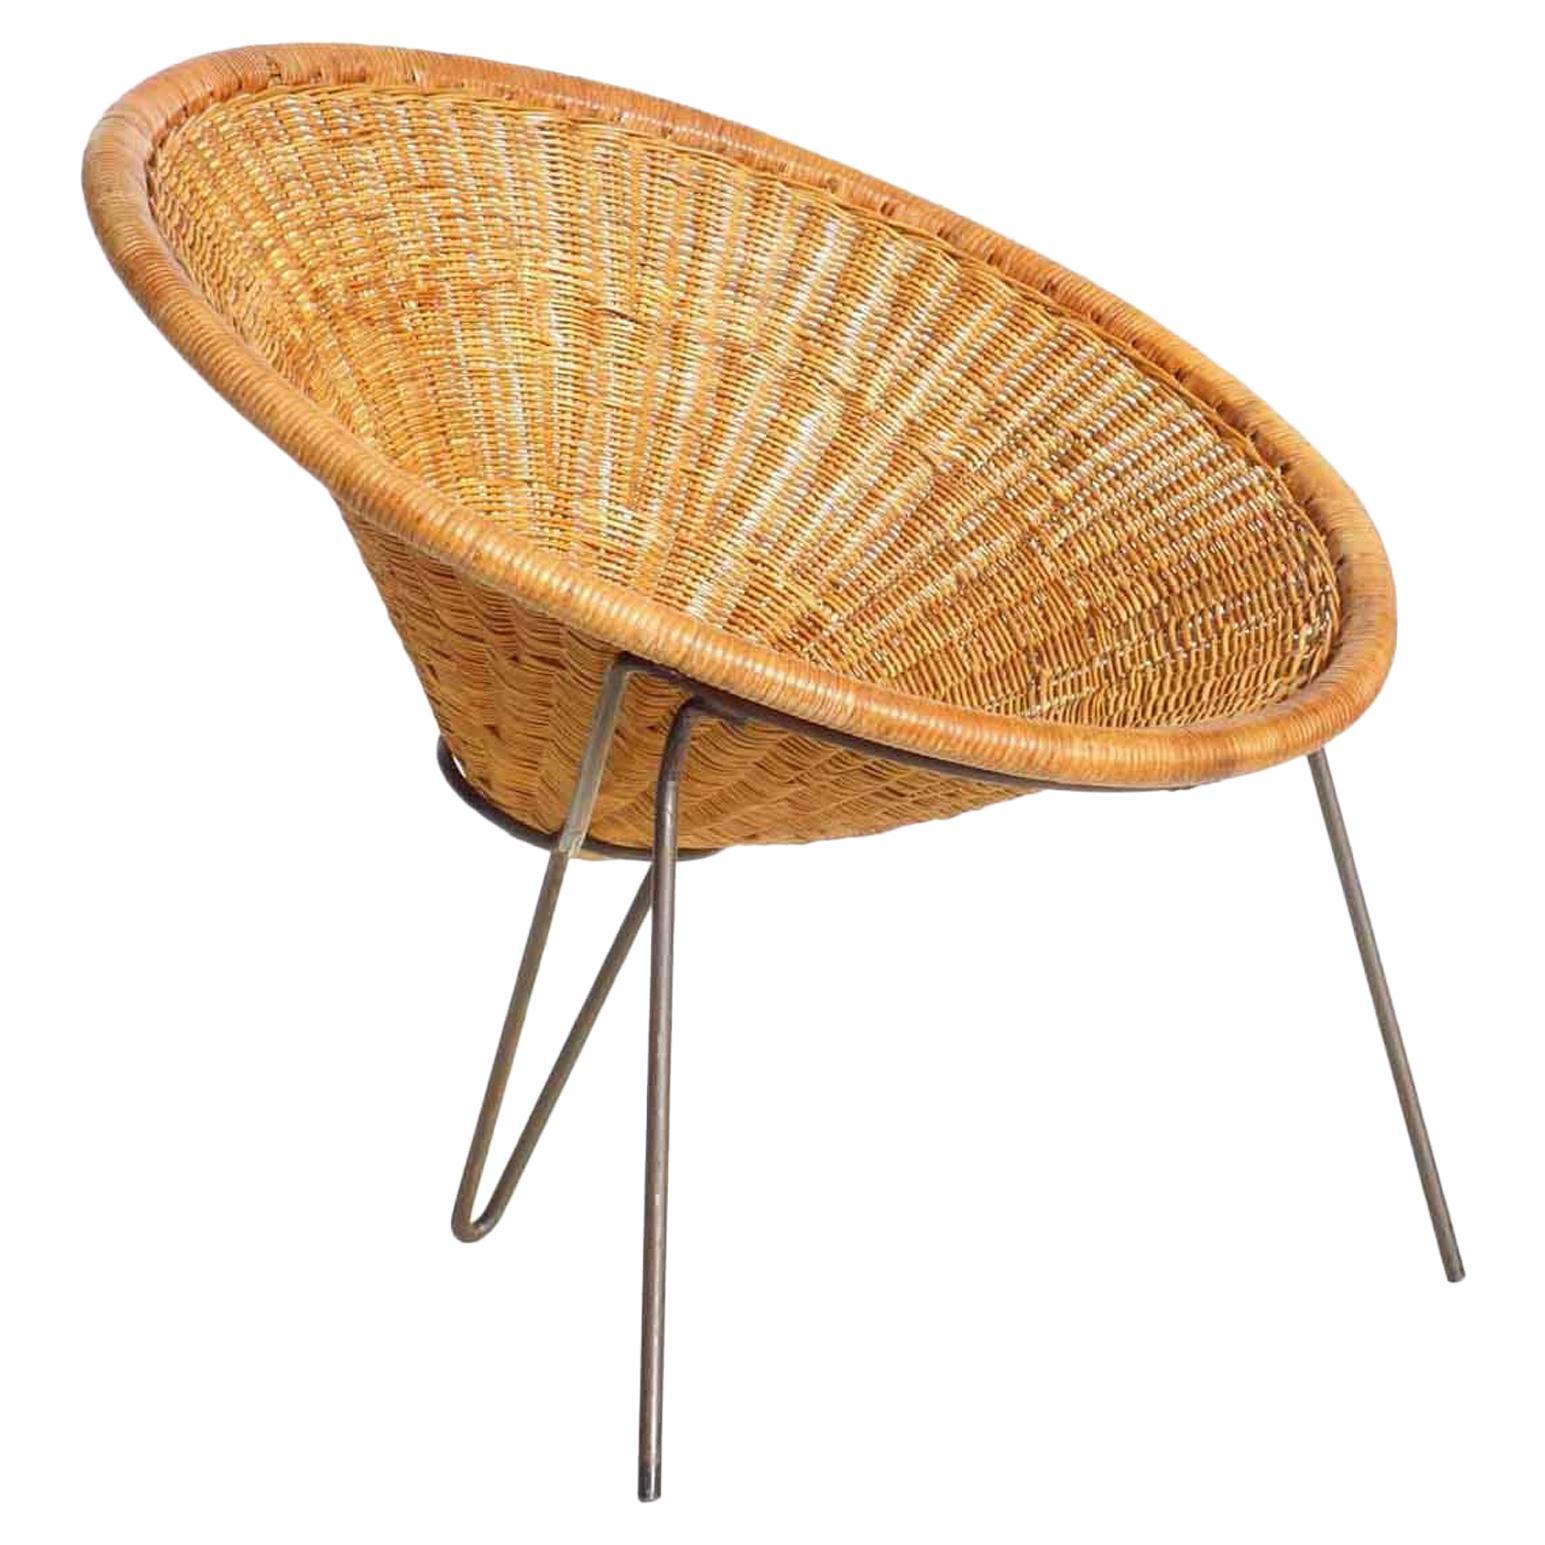 1950 Roberto Mango Italian Design Midcentury Rattan Wicker Armchair Lounge Chair